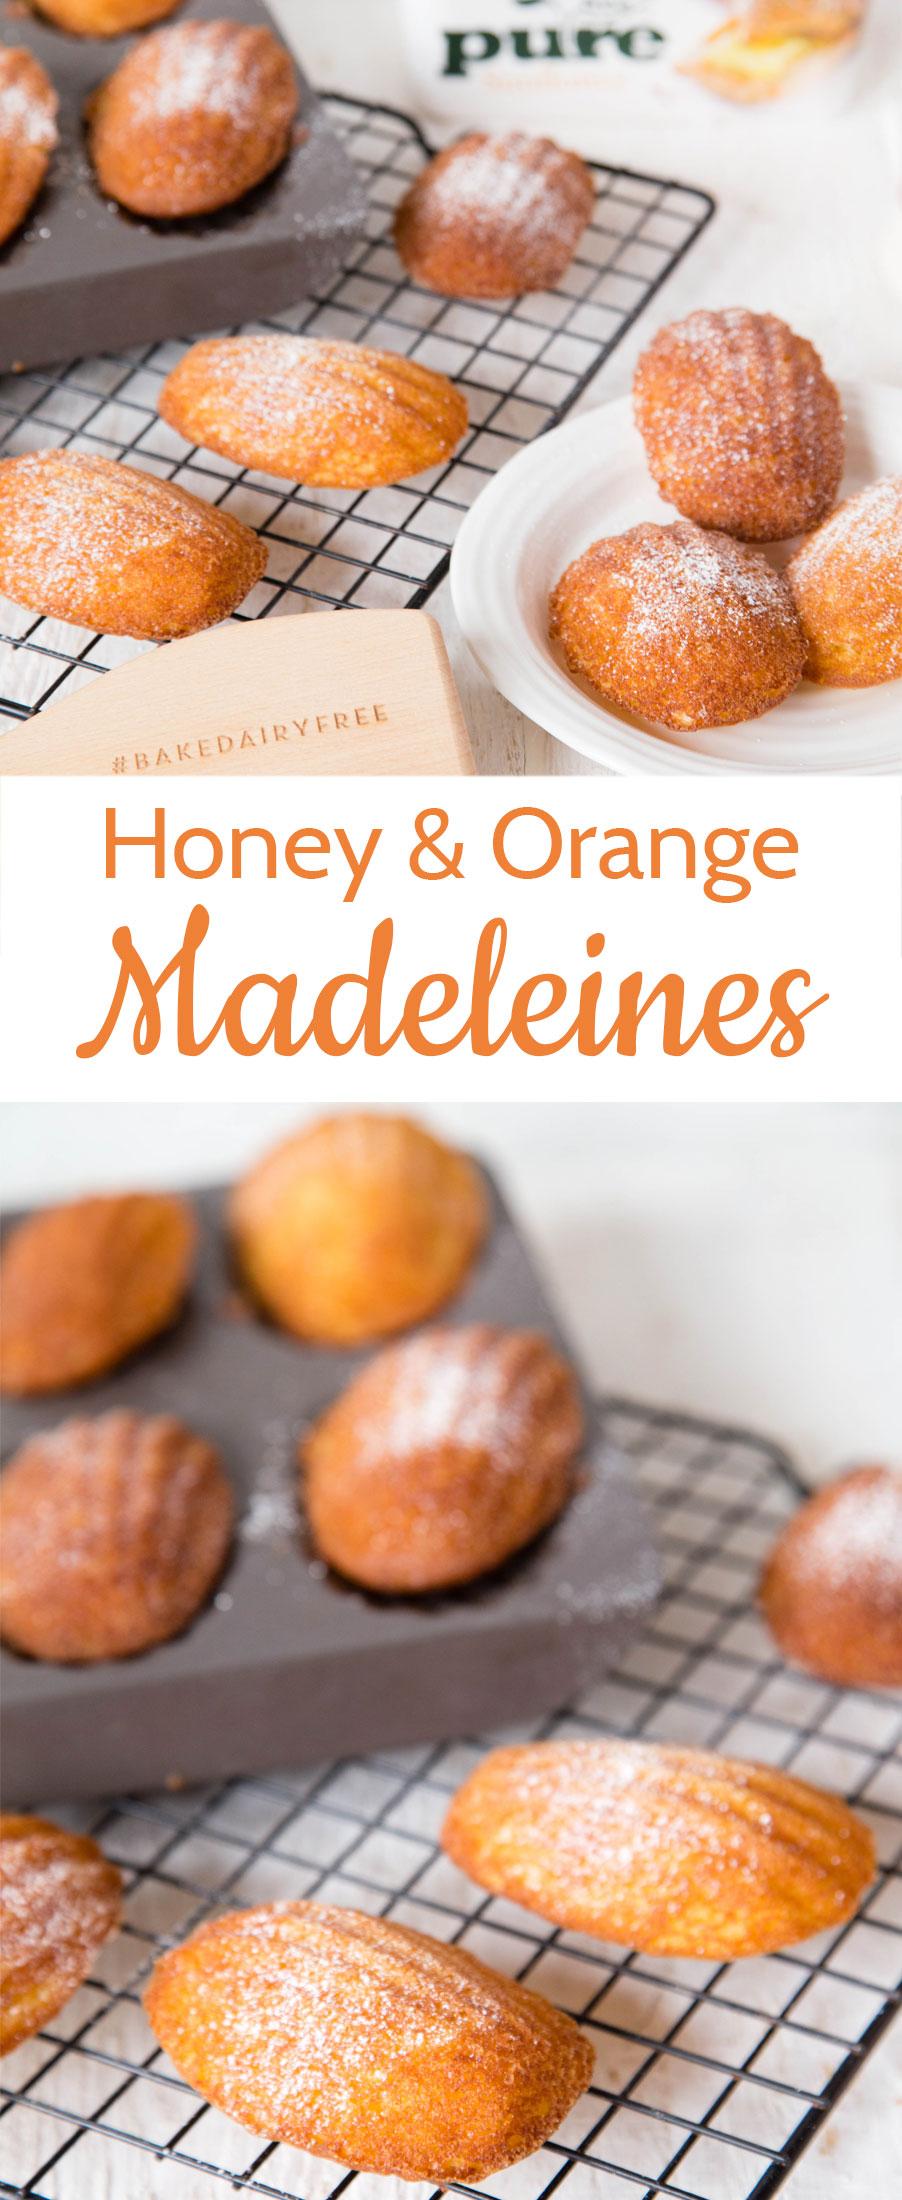 Honey Orange Madeleines - The Perfect Sweet Treat!